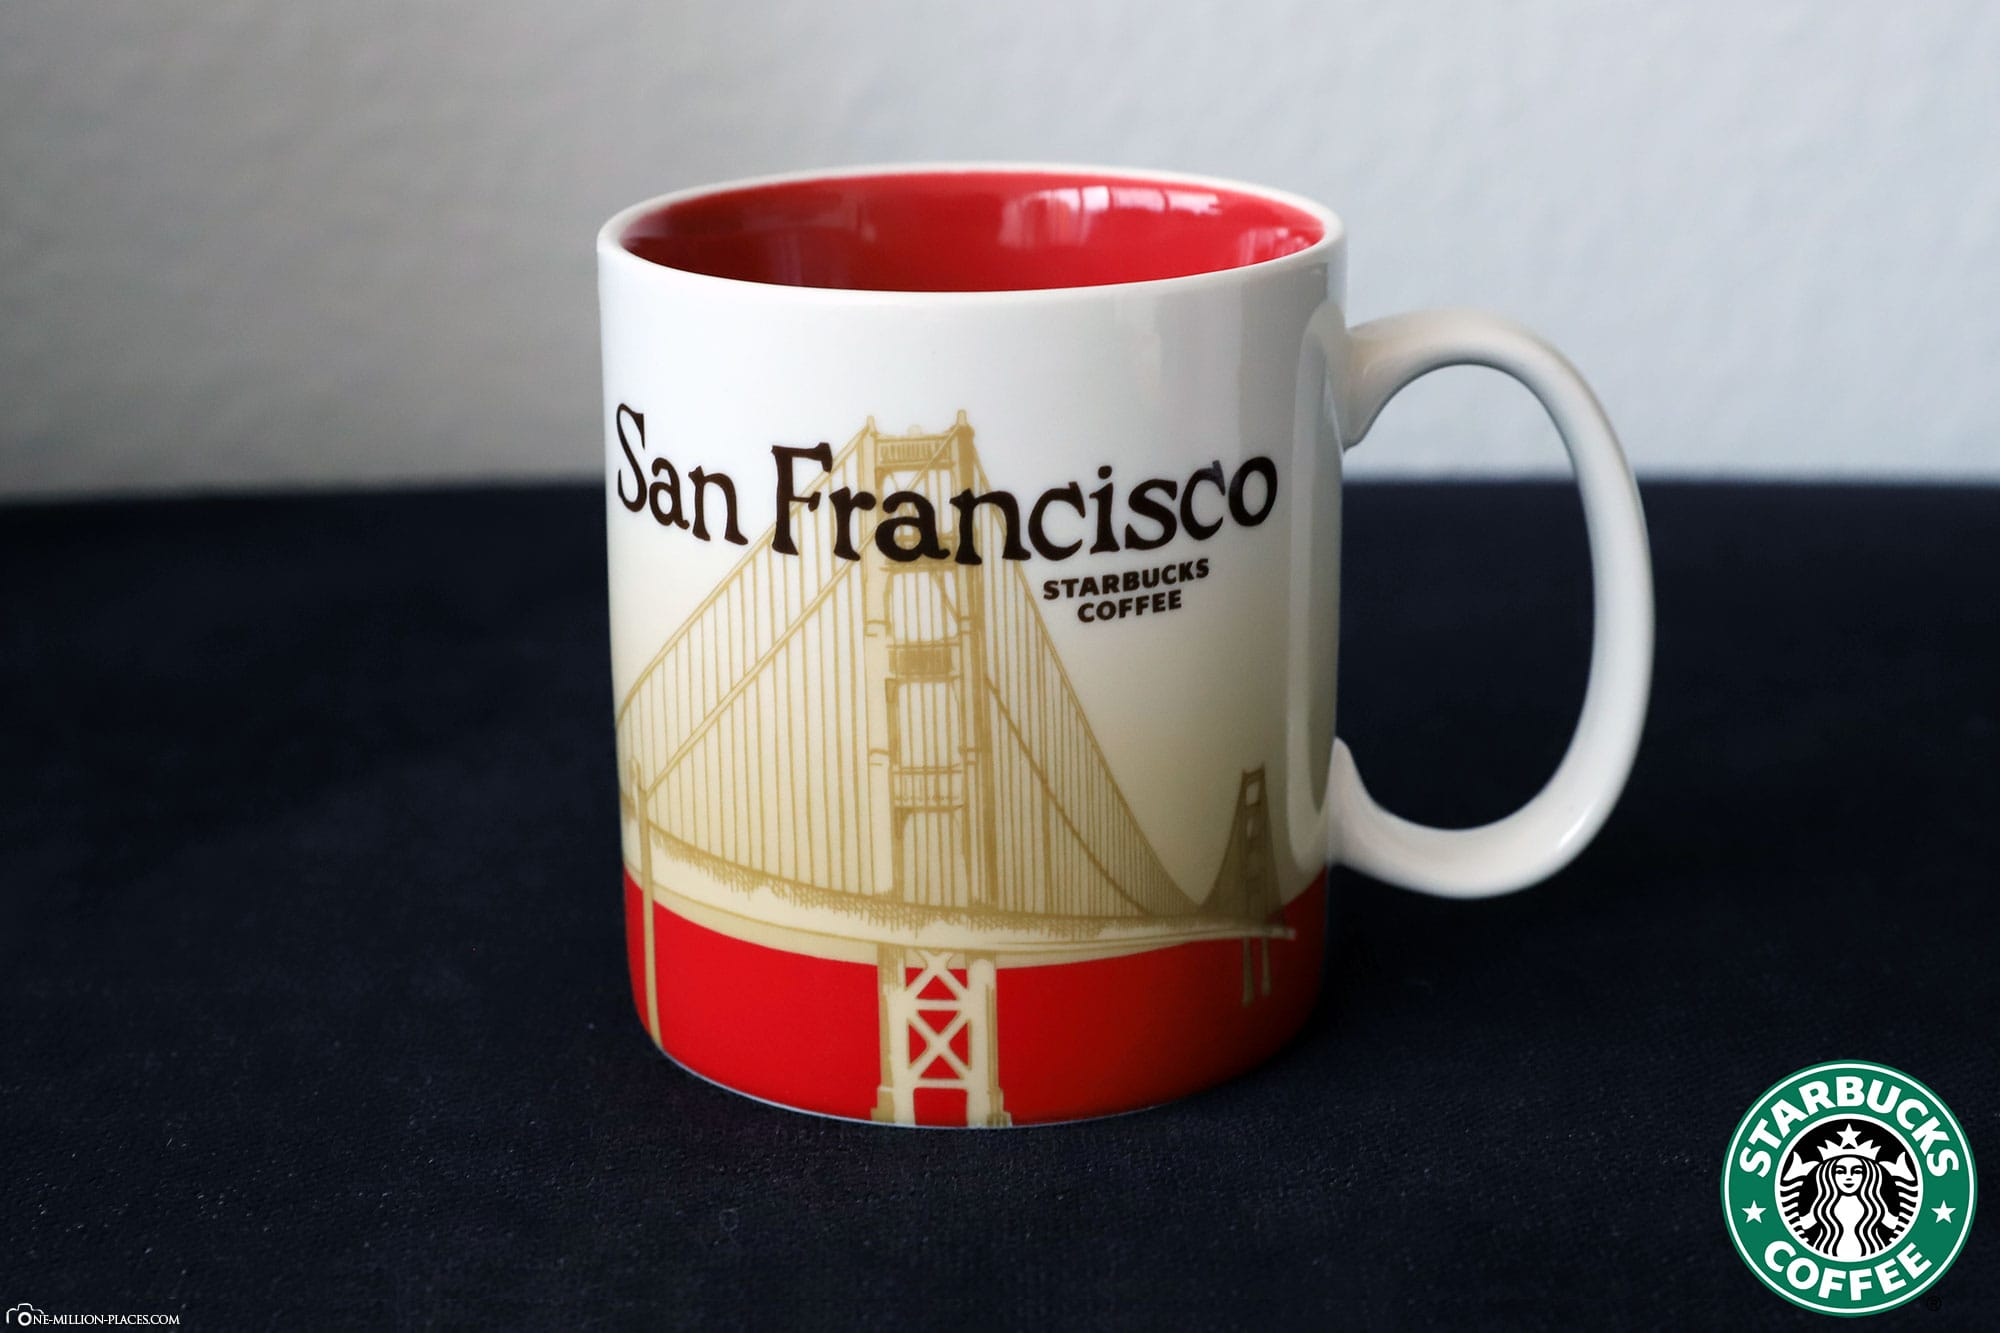 San Francisco, Starbucks Tasse, Global Icon Serie, City Mugs, Sammlung, USA, Reisebericht